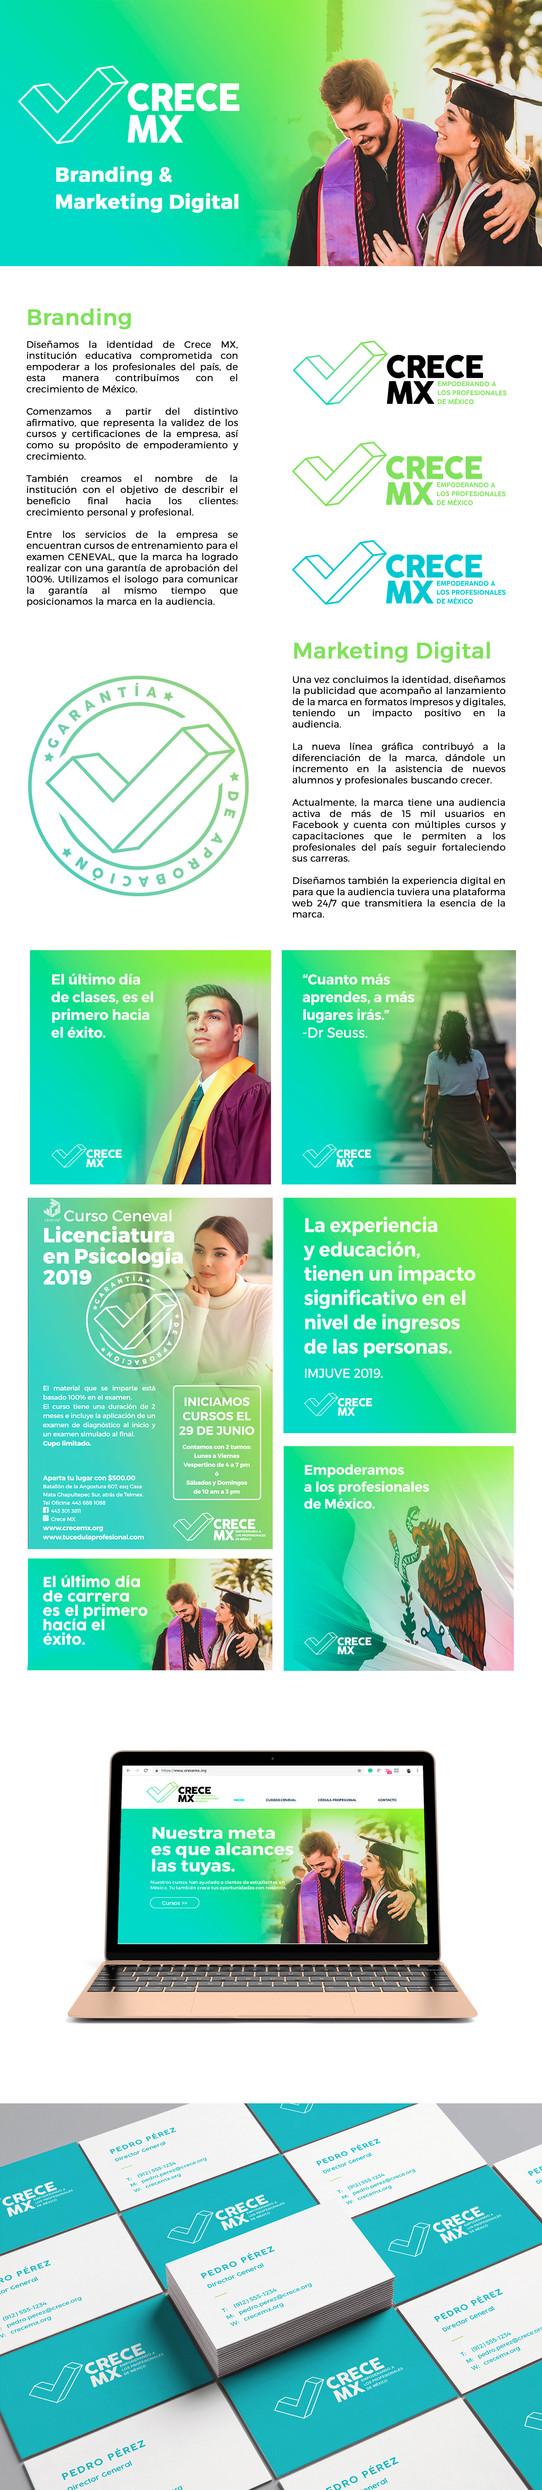 Instinto Creativo para Crece MX por Bestial Design